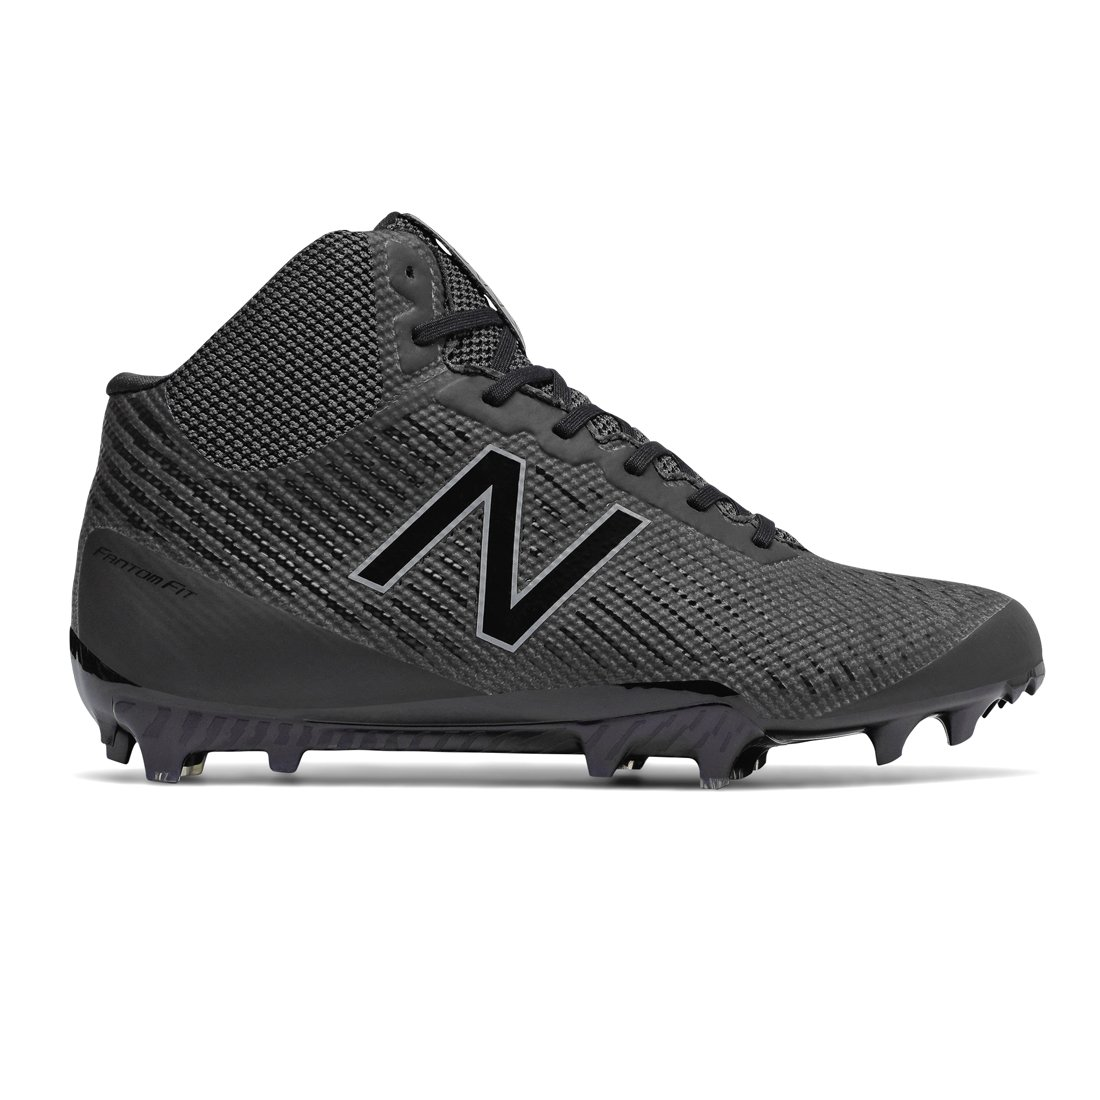 bf01cc7ab6c5 Amazon.com: New Balance Burn X Mid Lacrosse Cleats: Sports & Outdoors